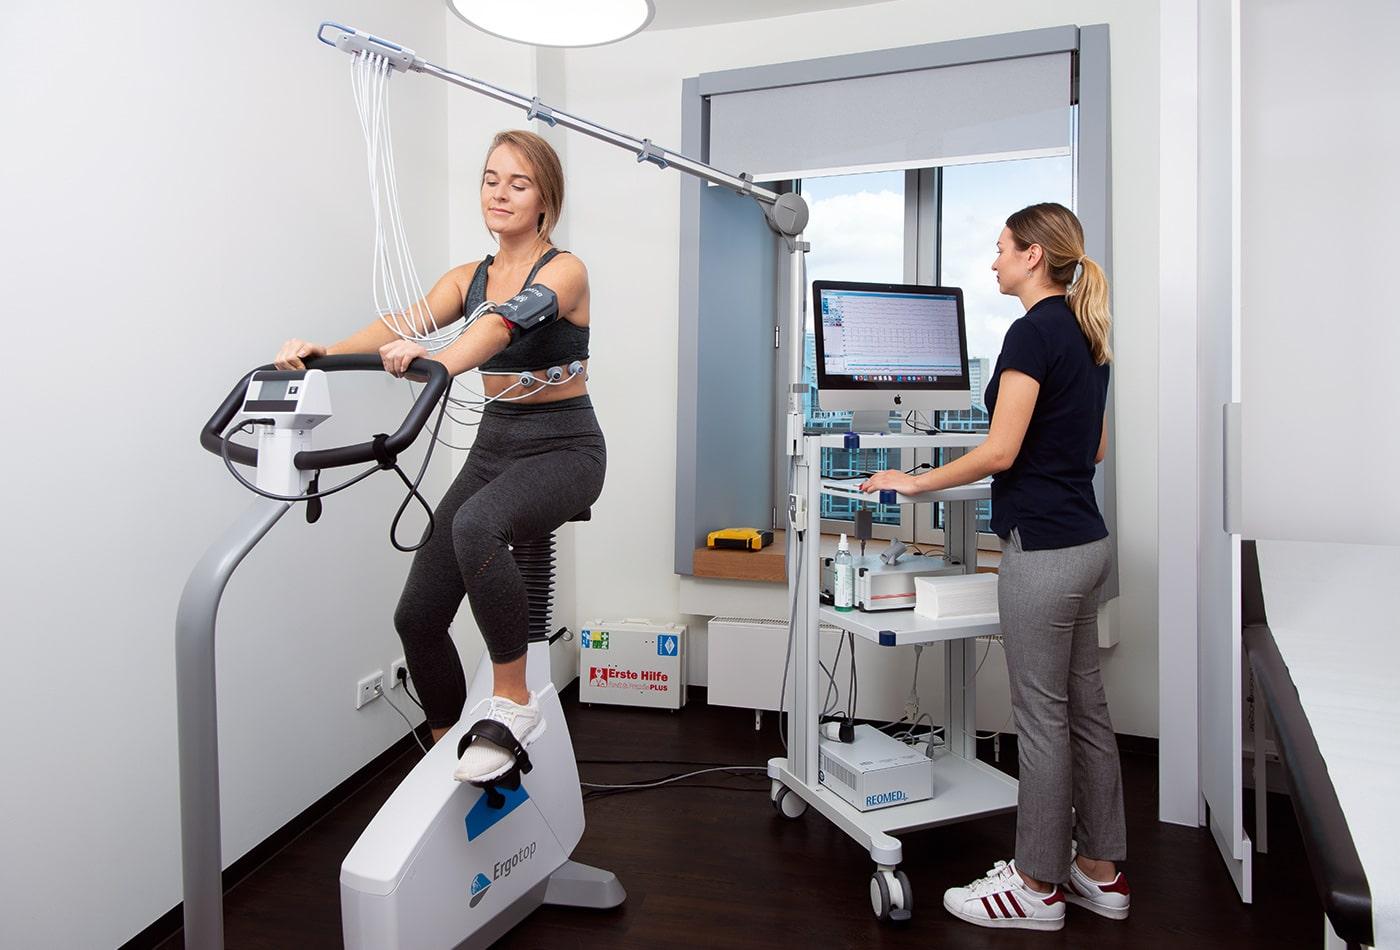 Sportkardiologie Fahrradergometer Sportmedizin Diagnostik EKG